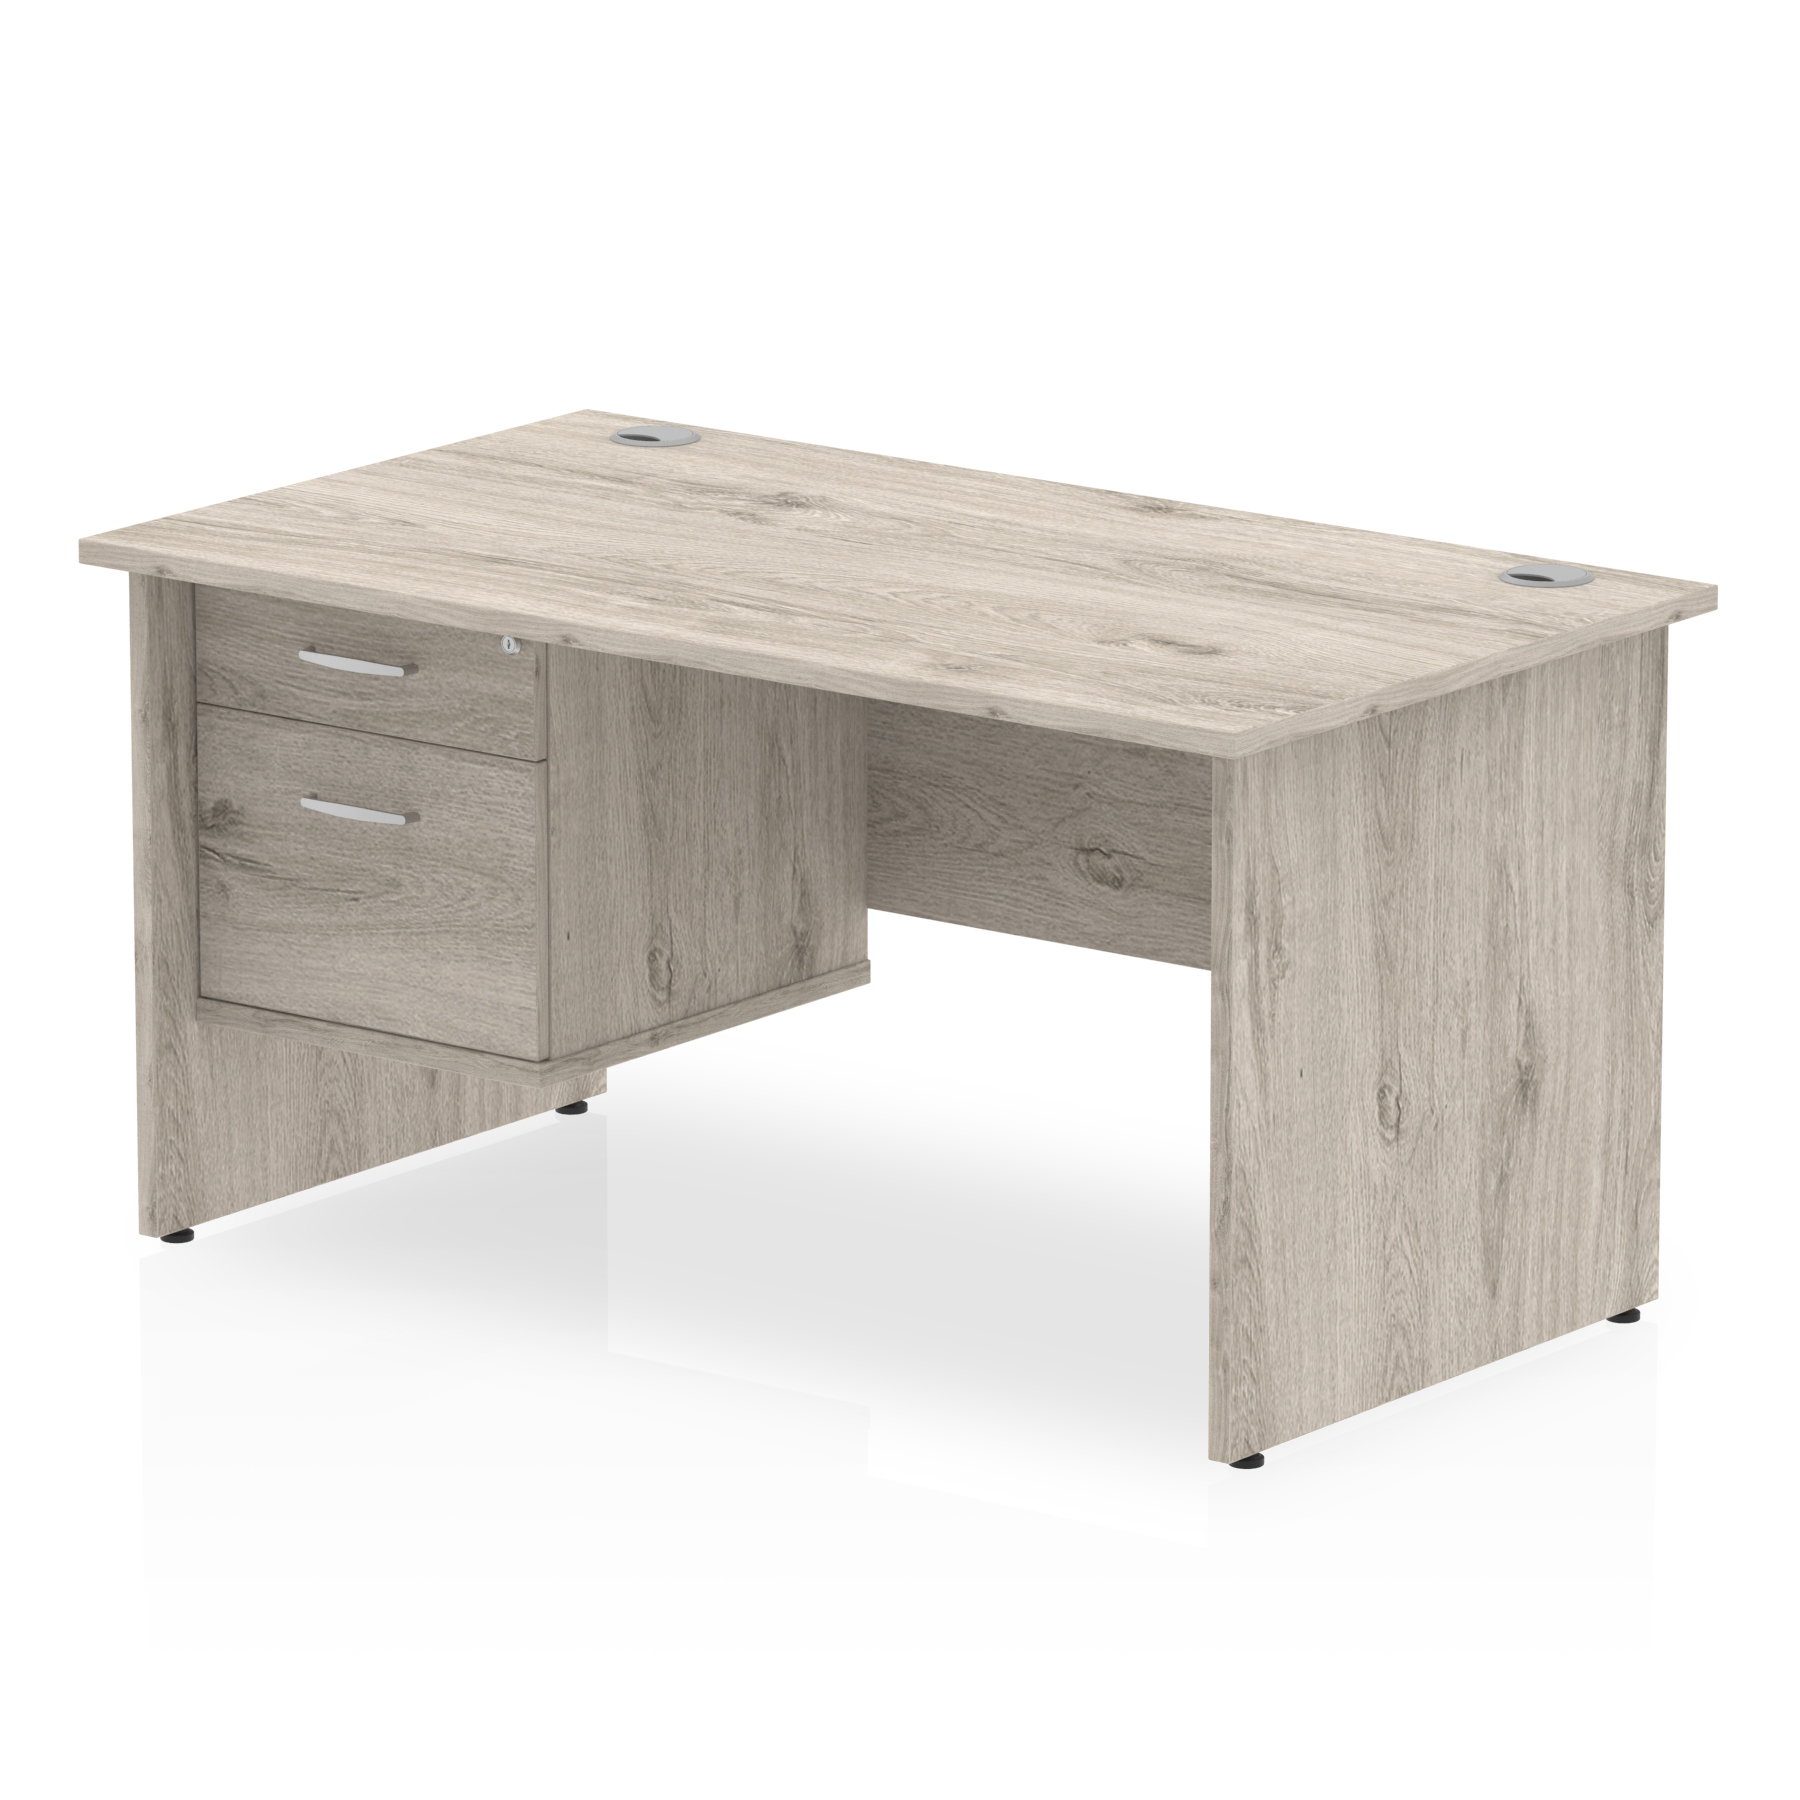 Trexus Rectangular Desk Panel End Leg 1400x800mm Fixed Pedestal 2 Drawers Grey Oak Ref I003451